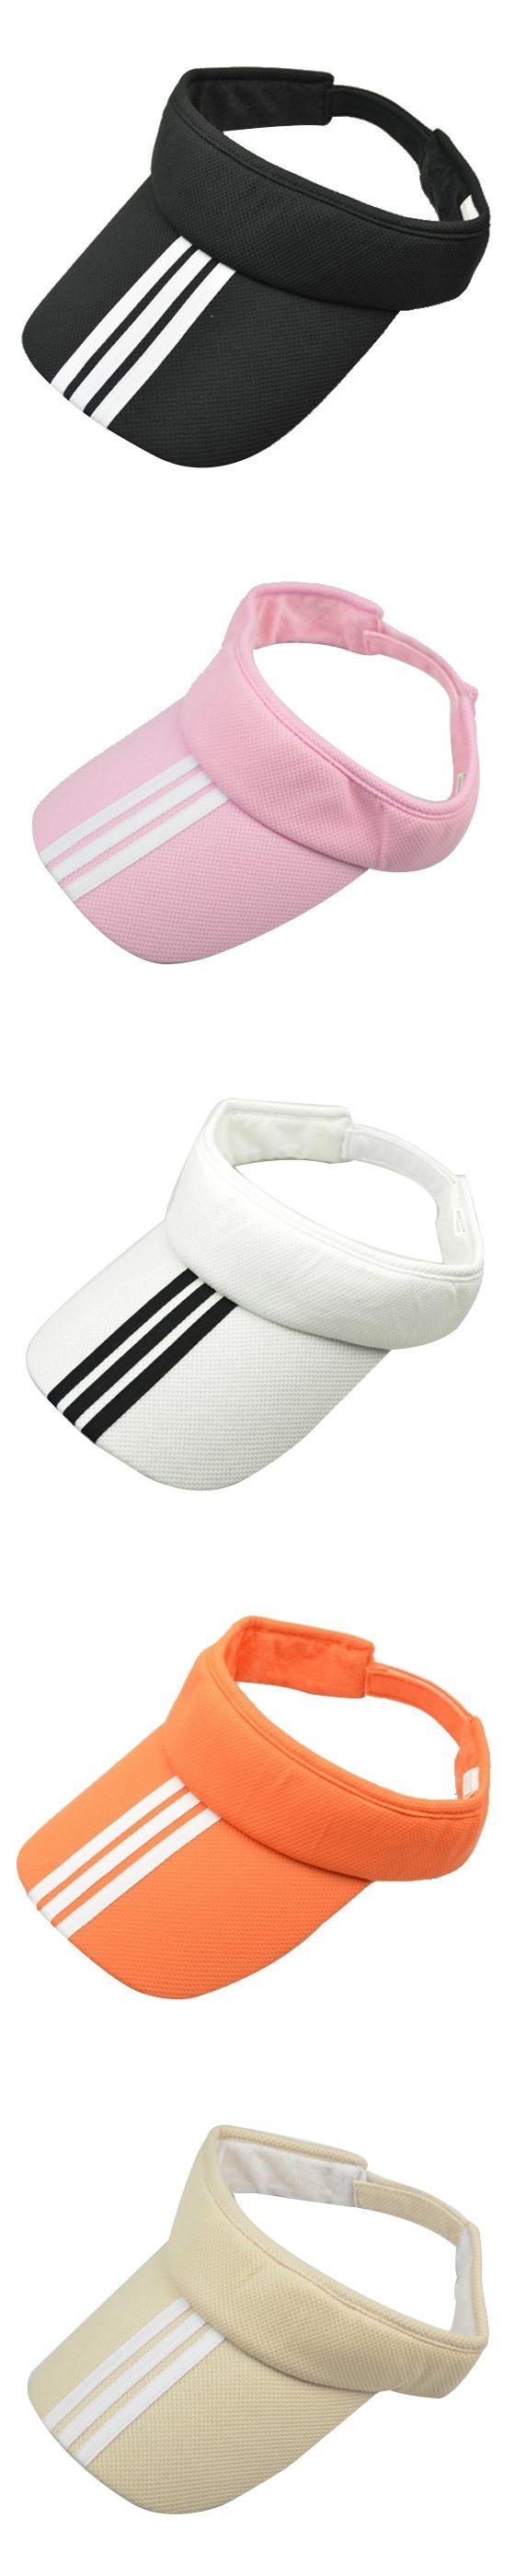 Tennis Golf Sun Visor Hat Hats Adjustable Plain Bright Color Men Women red